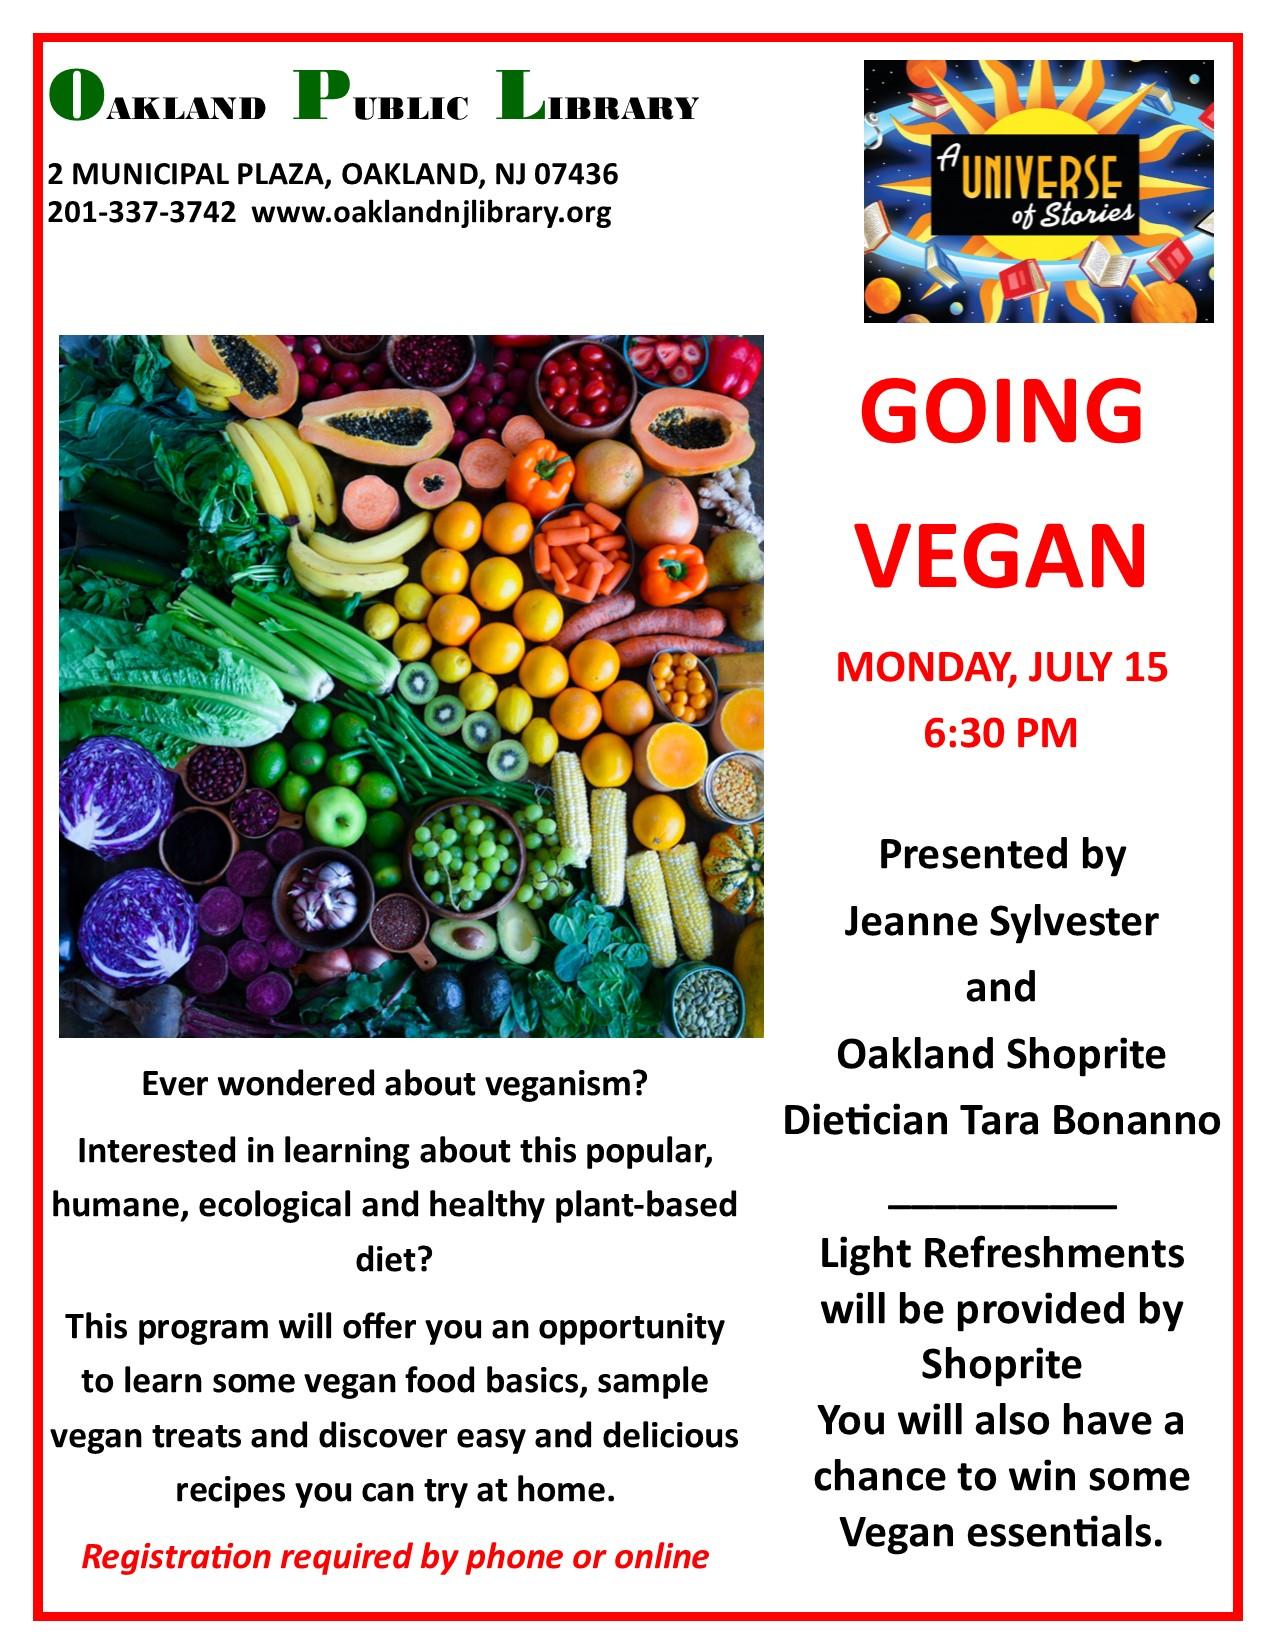 Going Vegan!